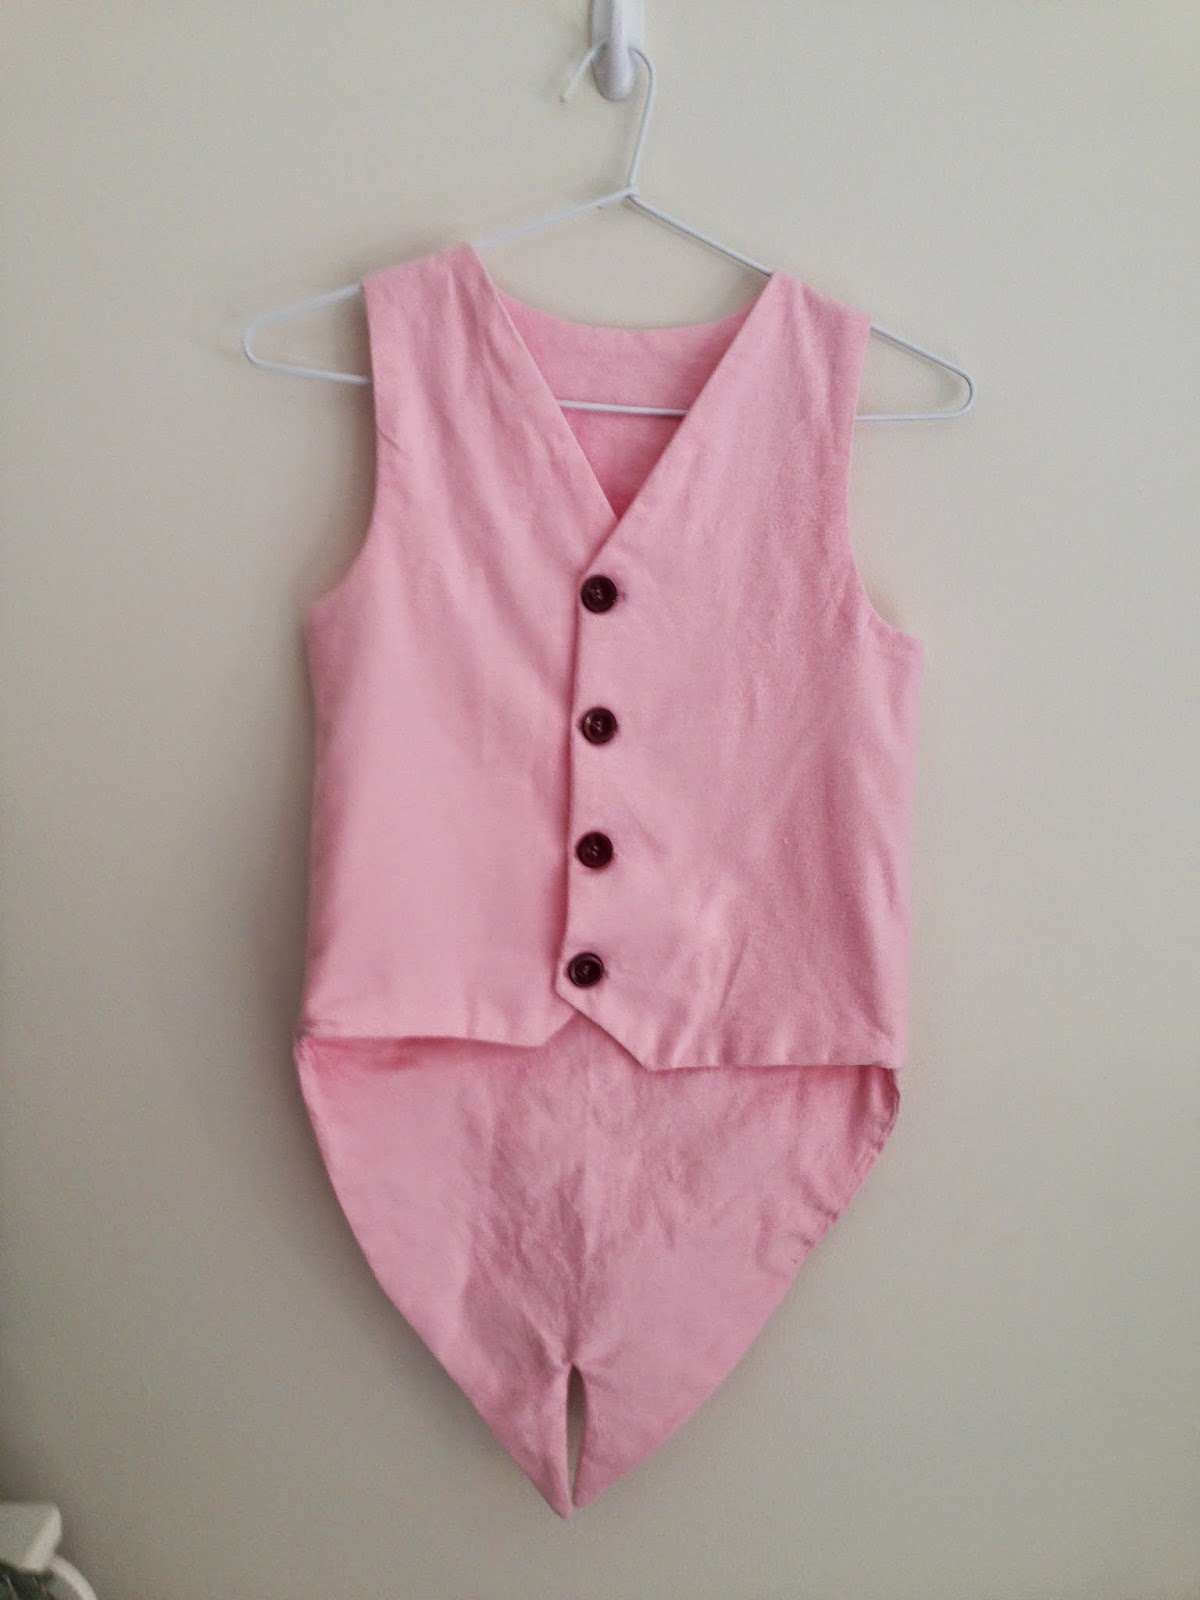 Schoolboy Vest Pig dress ups